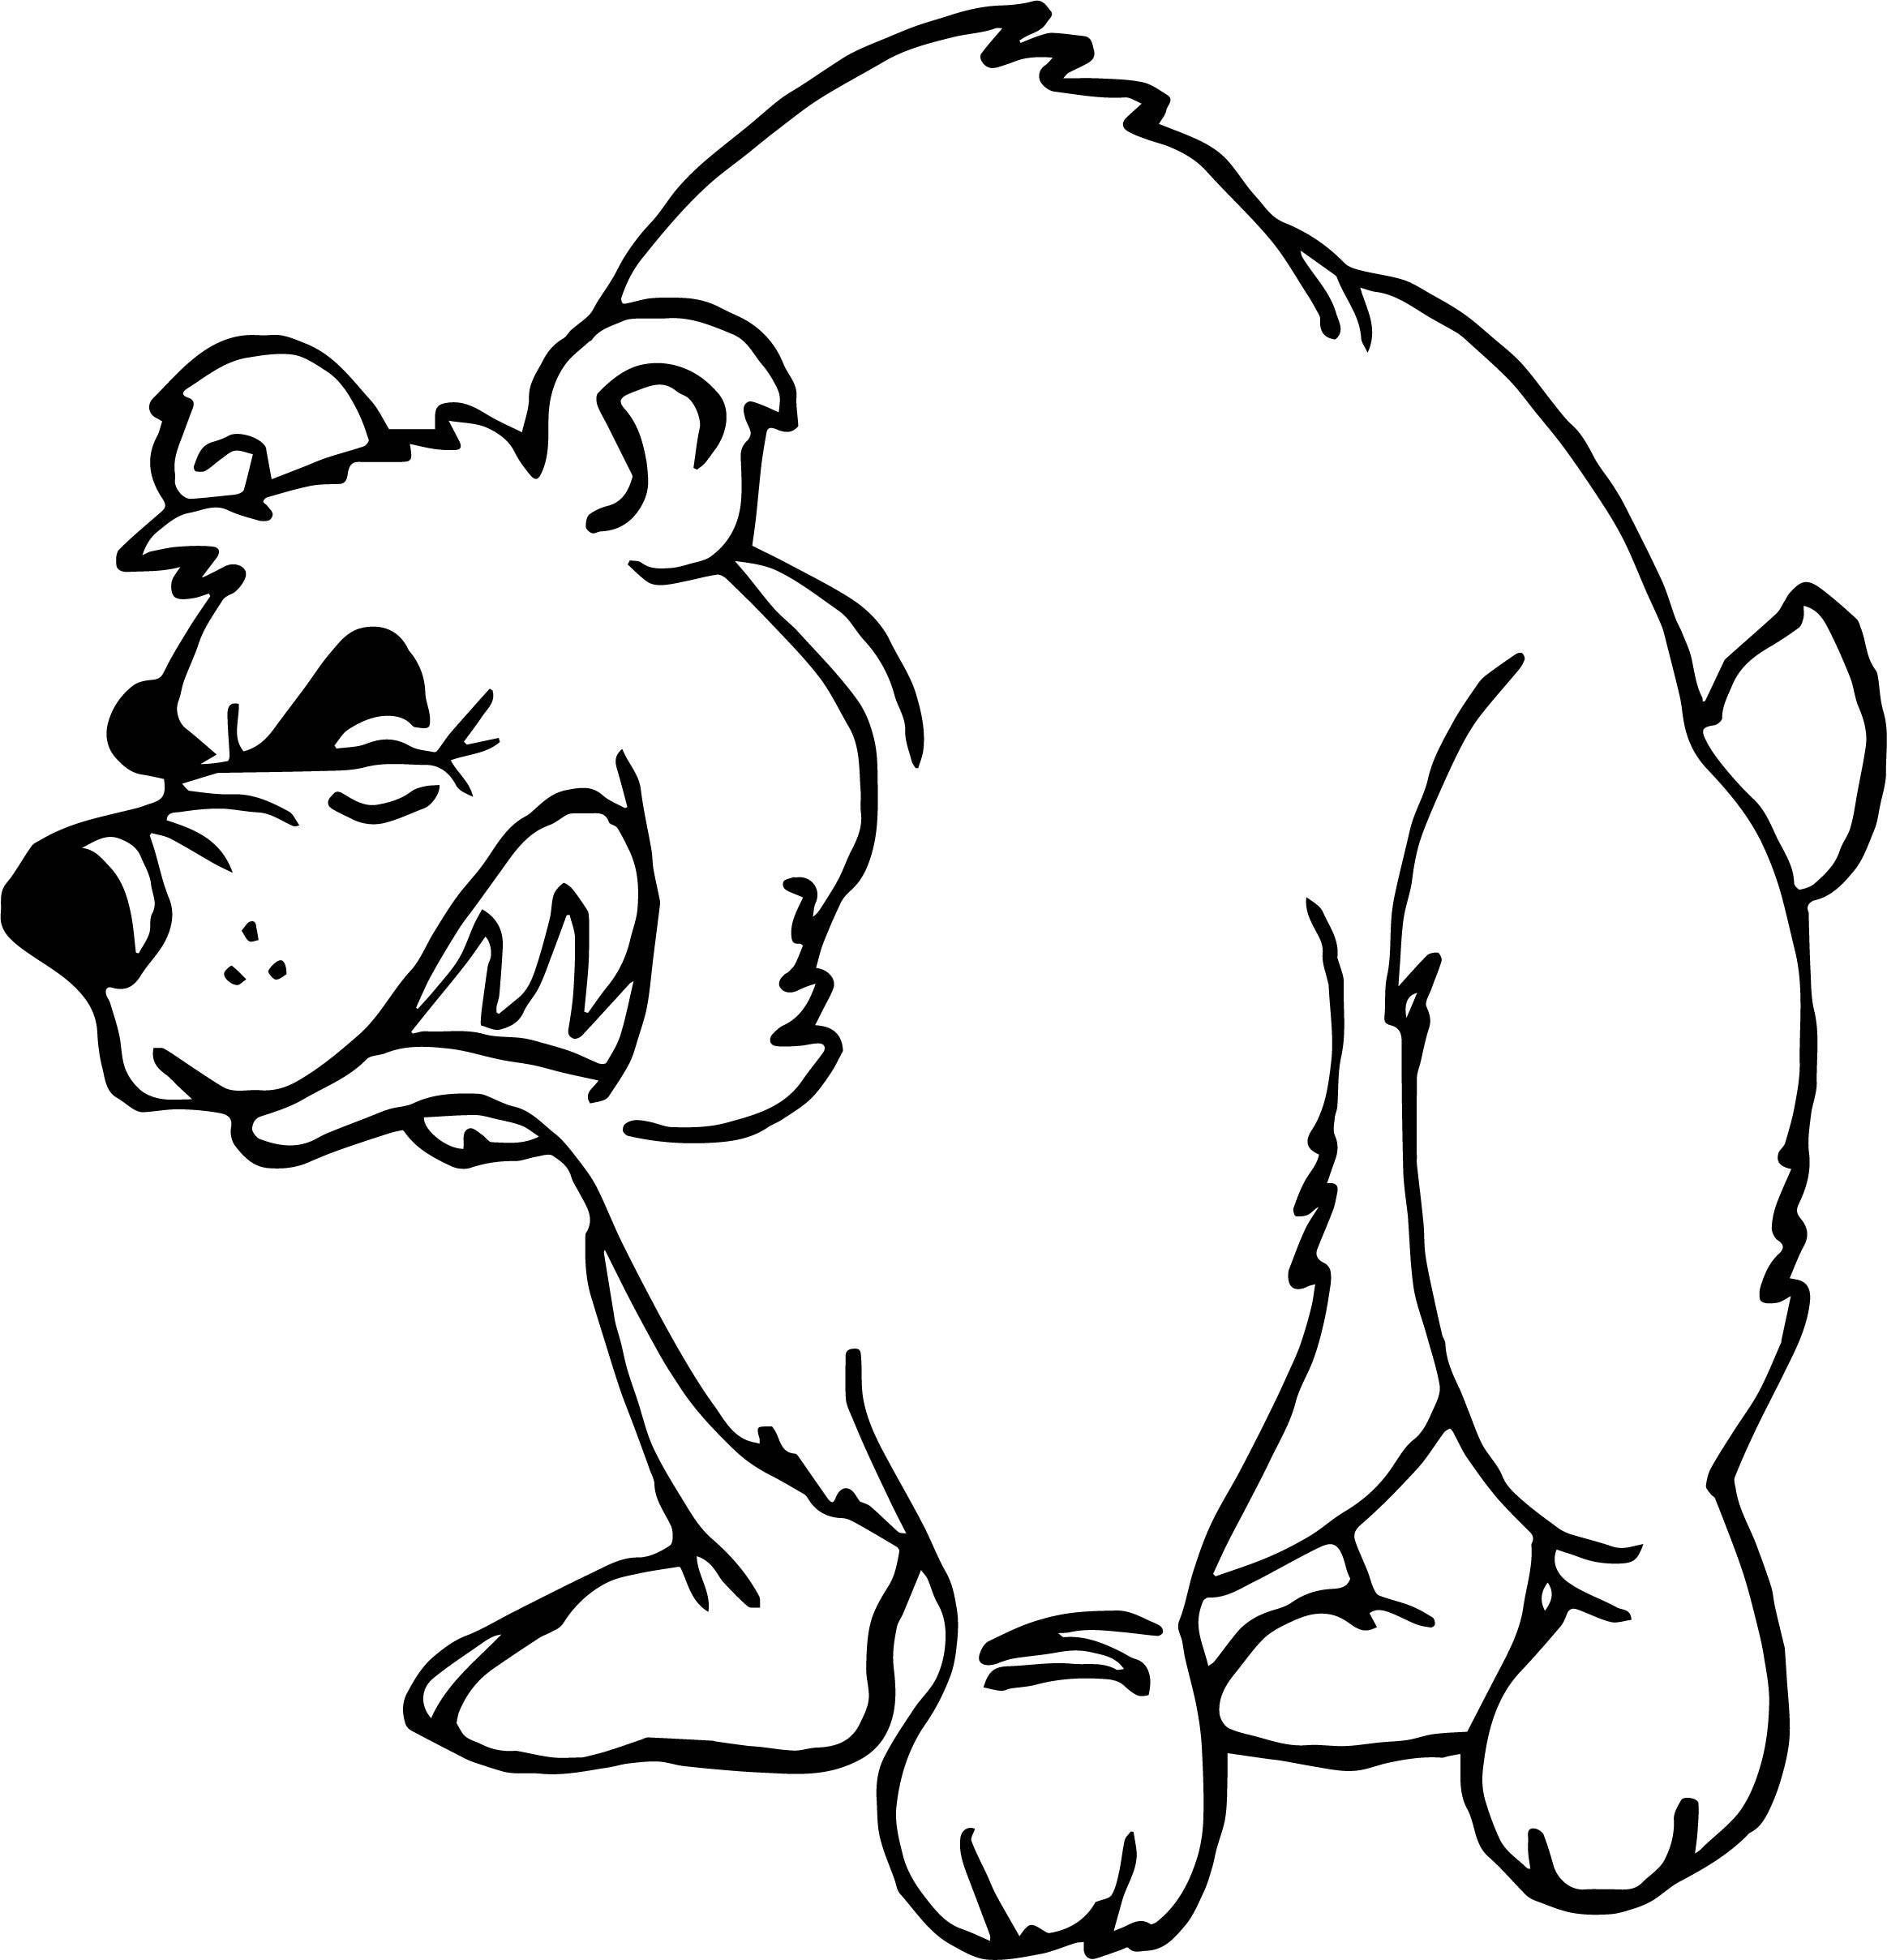 2327x2417 Polar Bear Face Easy Drawing Panda Brown Angry Baby Pencil